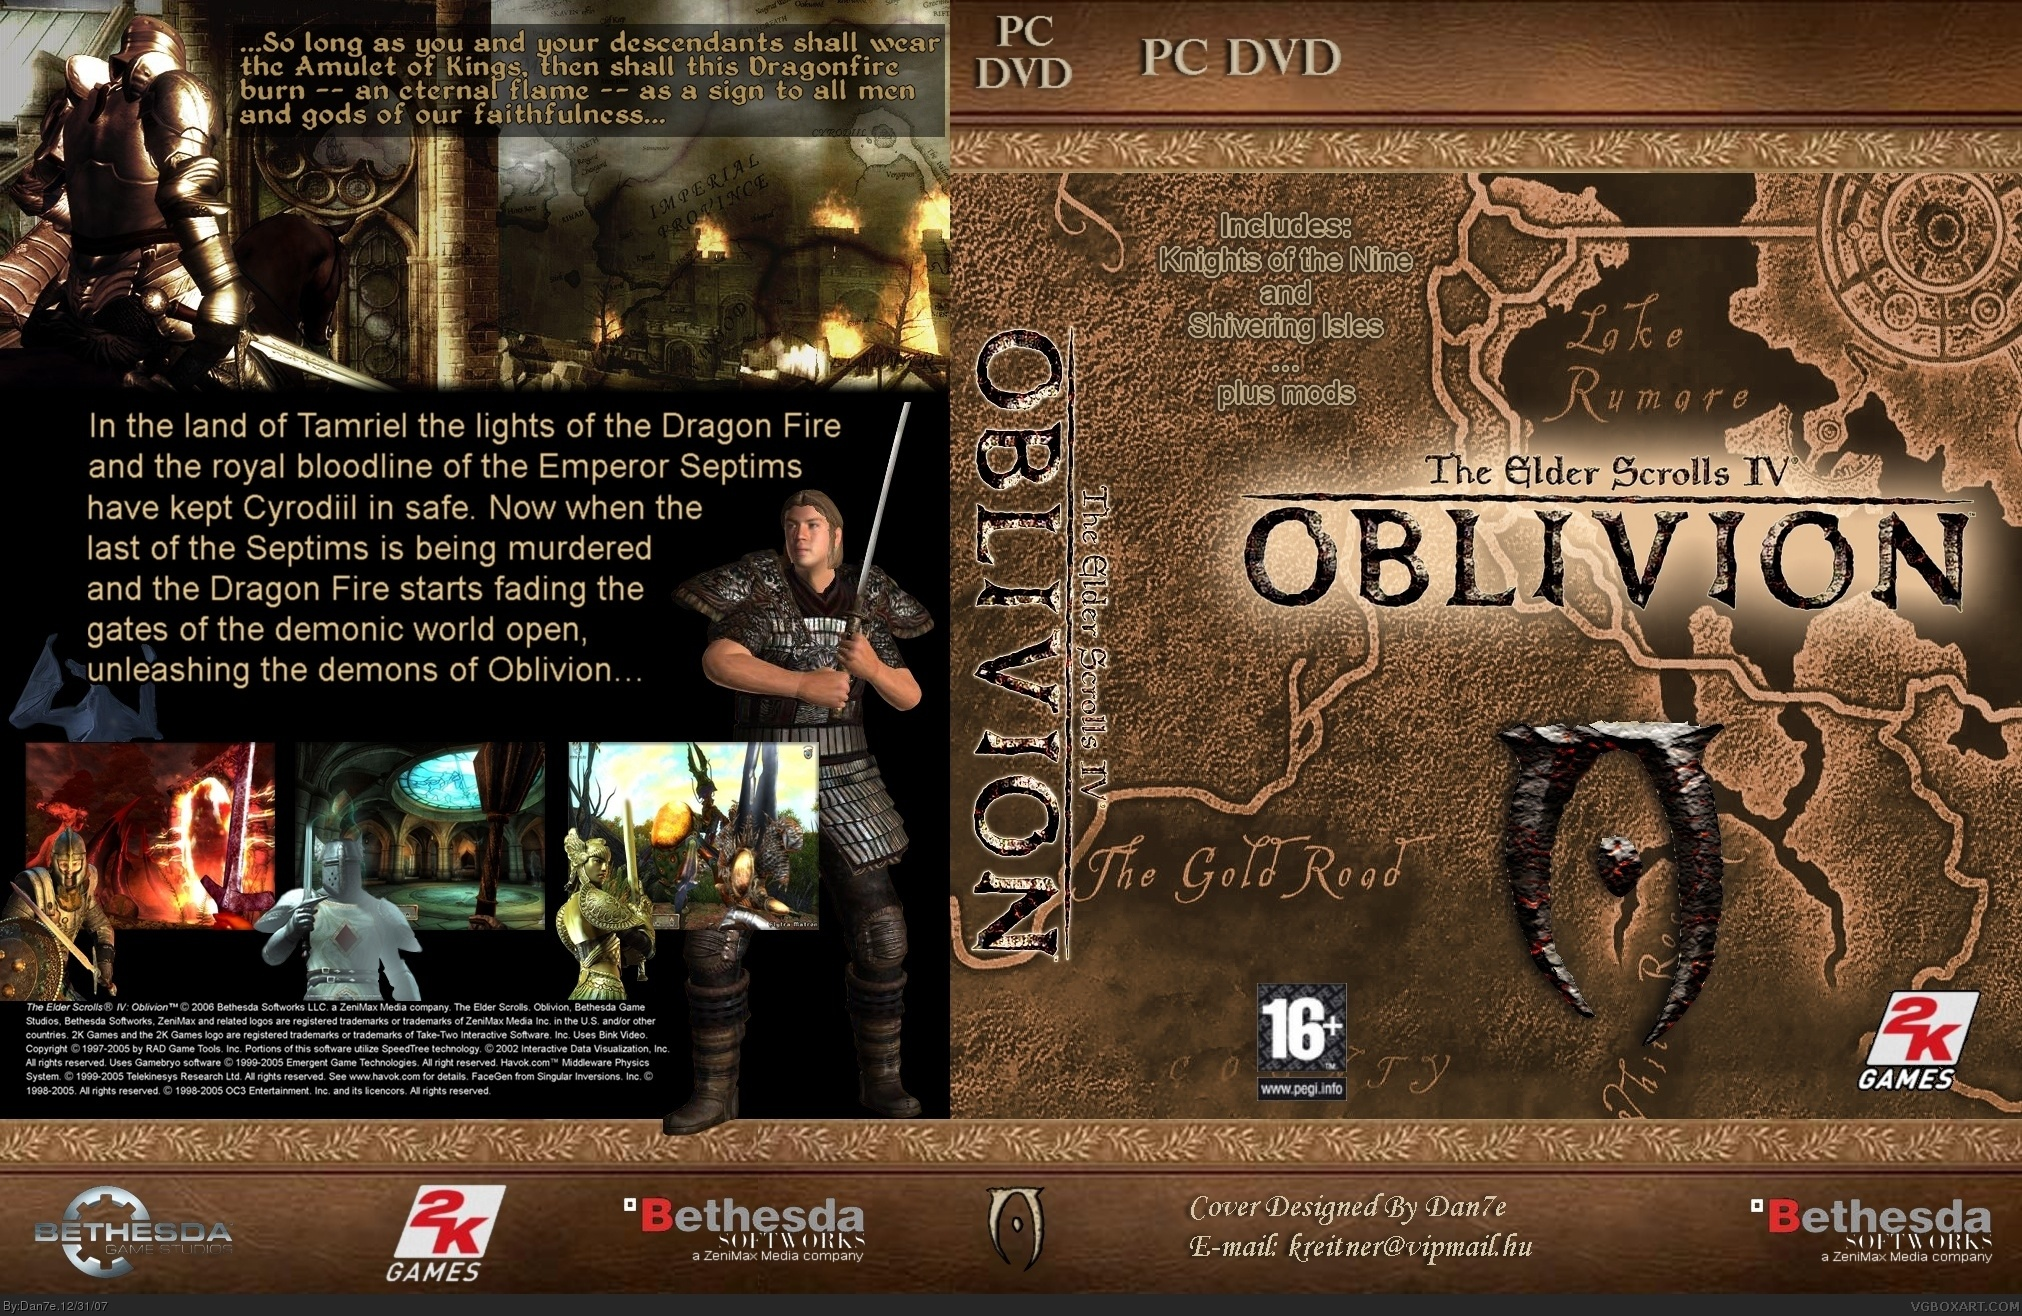 The Elder Scrolls Iv Oblivion Pc Box Art Cover By Dan7e